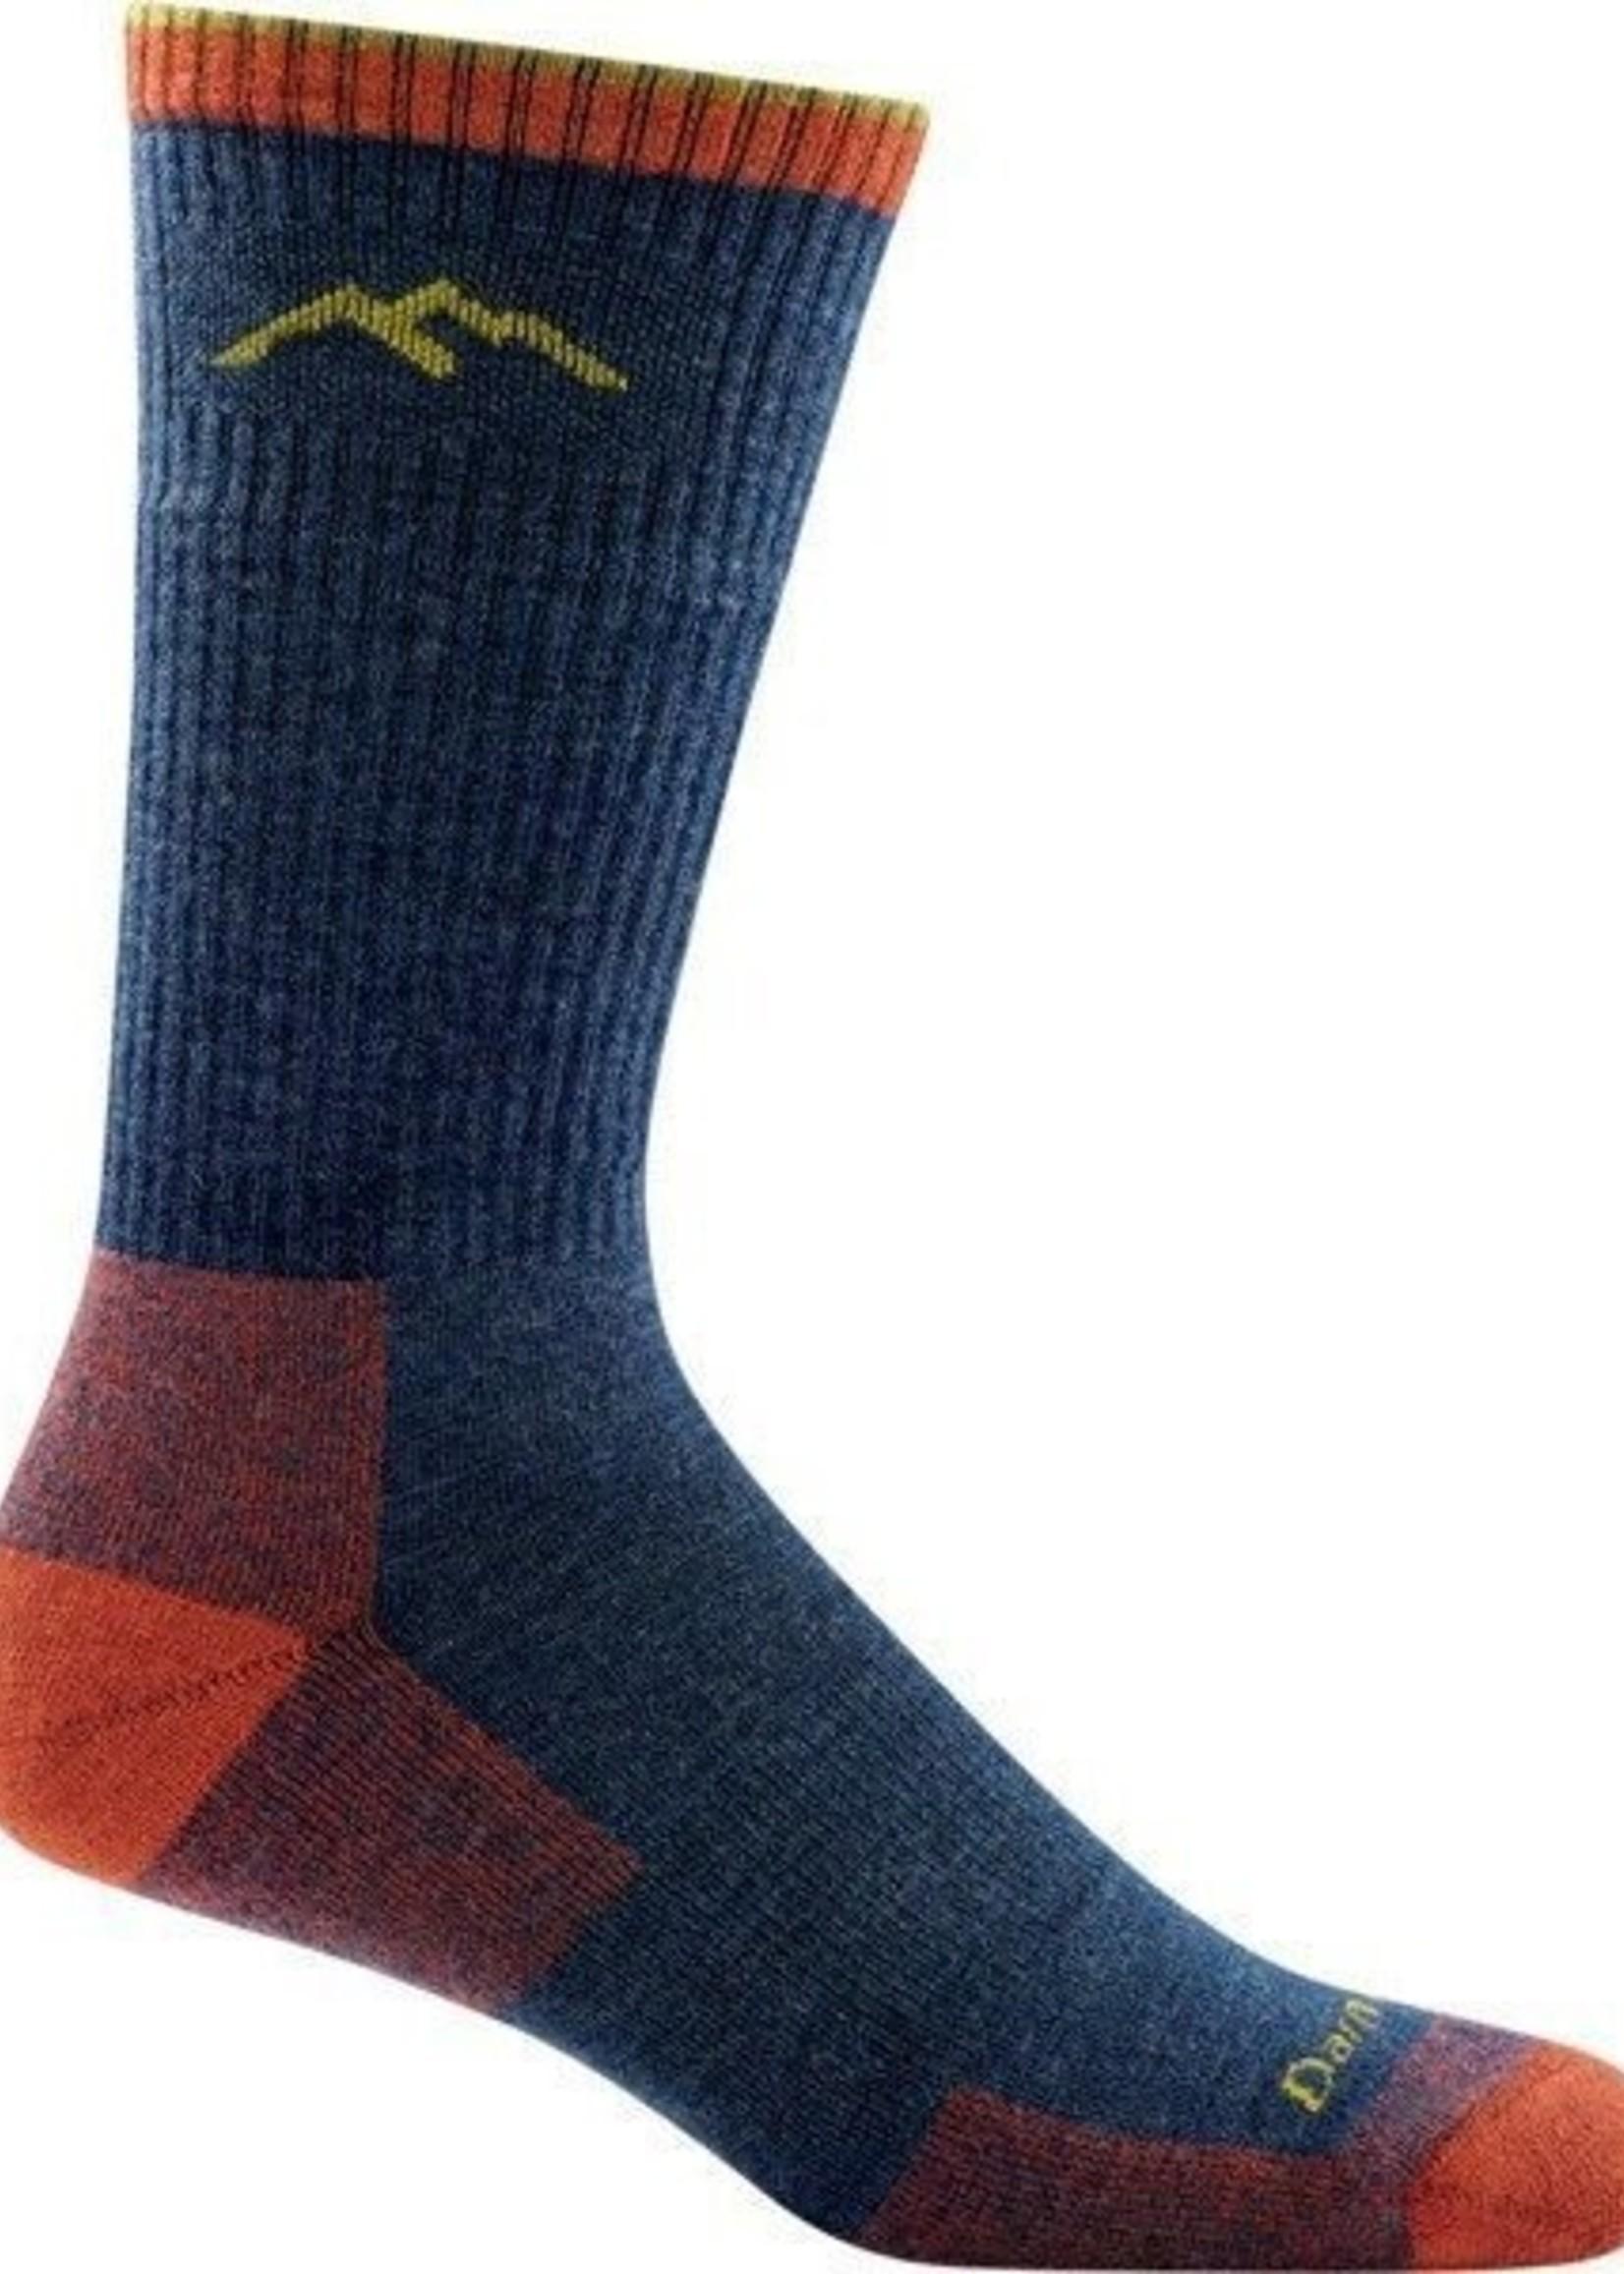 Darn Tough HIKER BOOT MID WEIGHT CUSHION SOCKS-DENIM